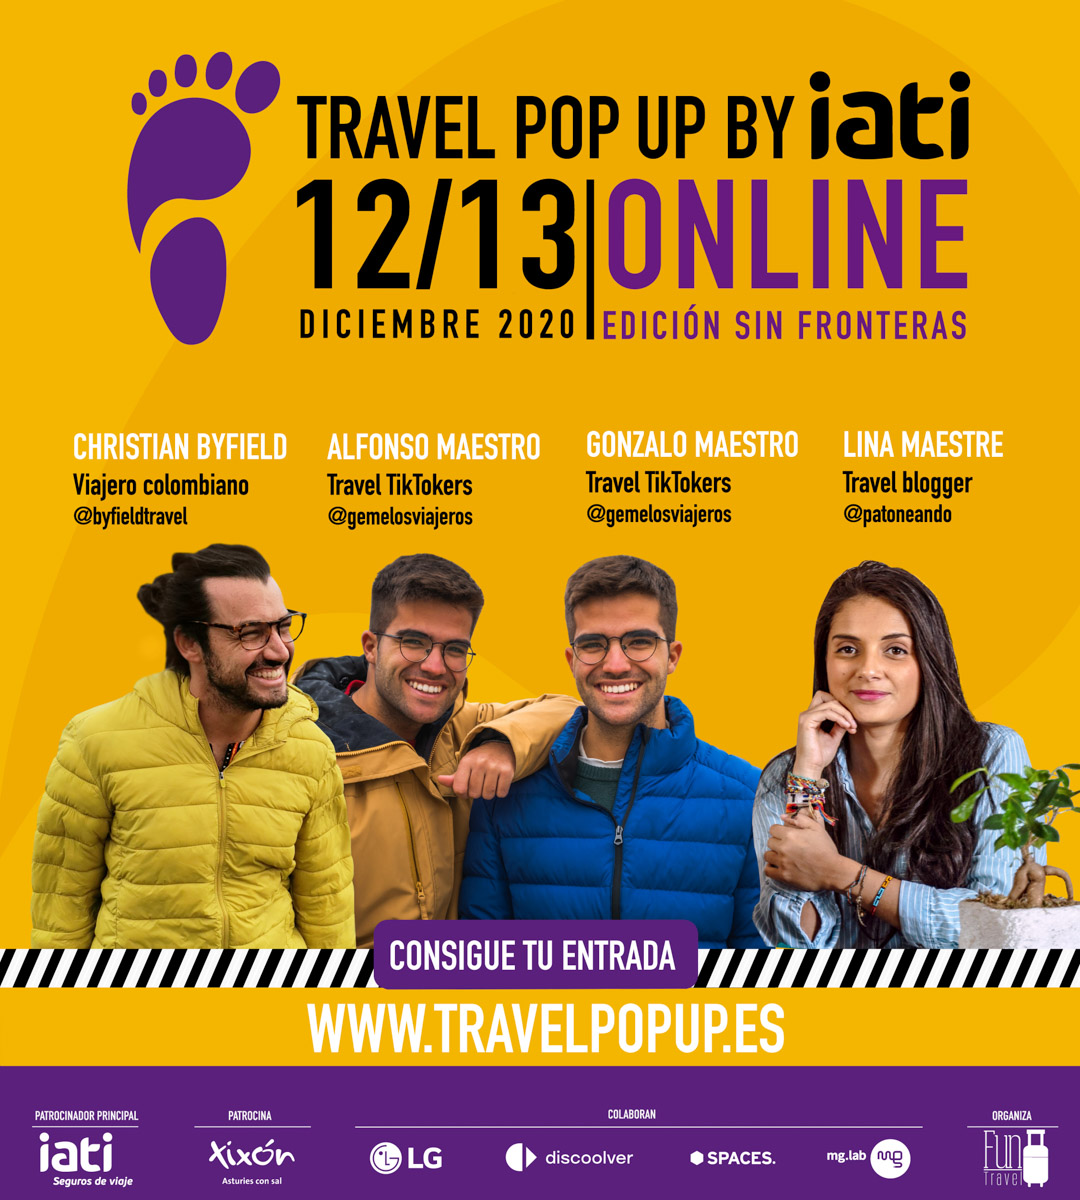 Travel-PupUp-Es-Lina-Maestre-Patoneando.jpg